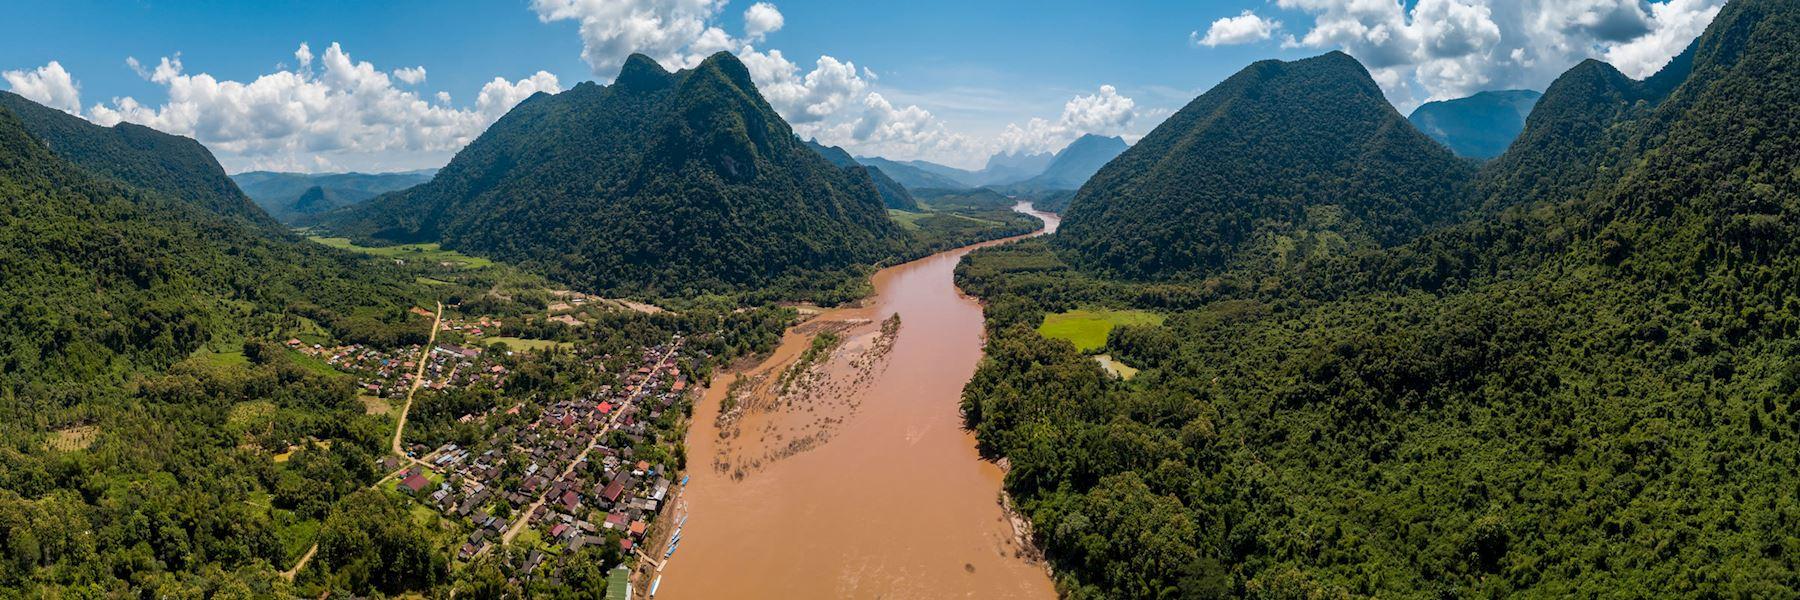 Visit Nong Khiaw, Laos